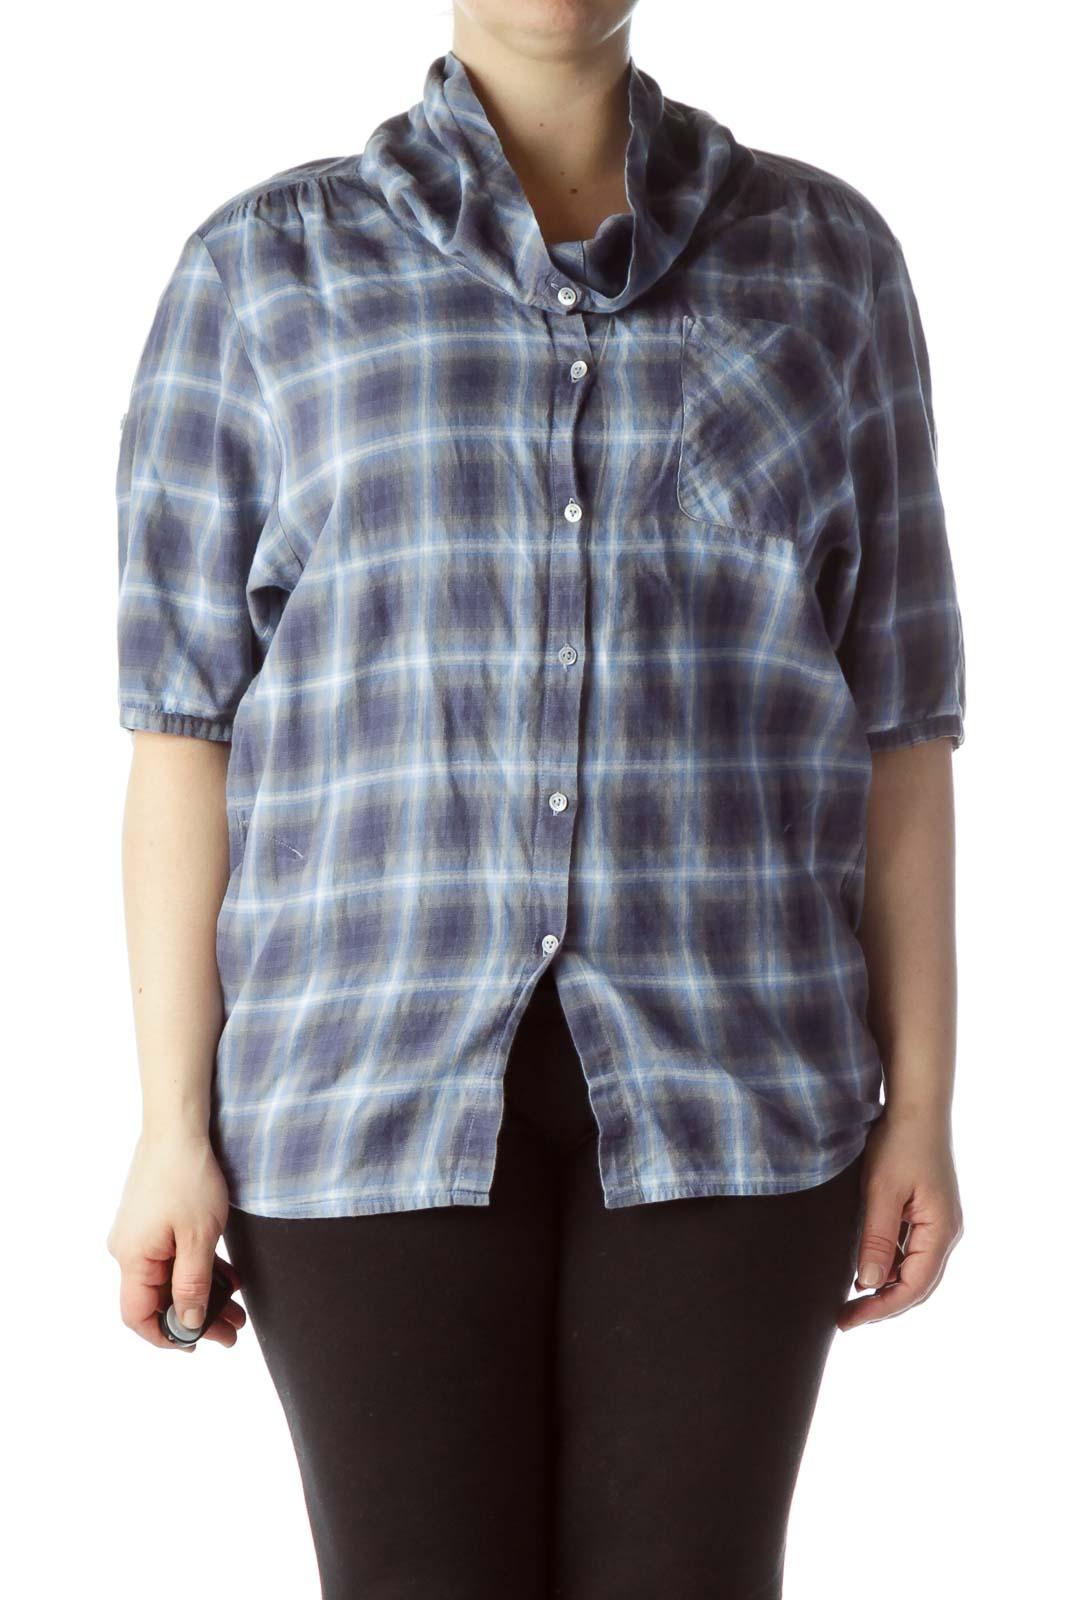 Blue Gray Plaid 100% Cotton Long 3/4 Sleeve Shirt